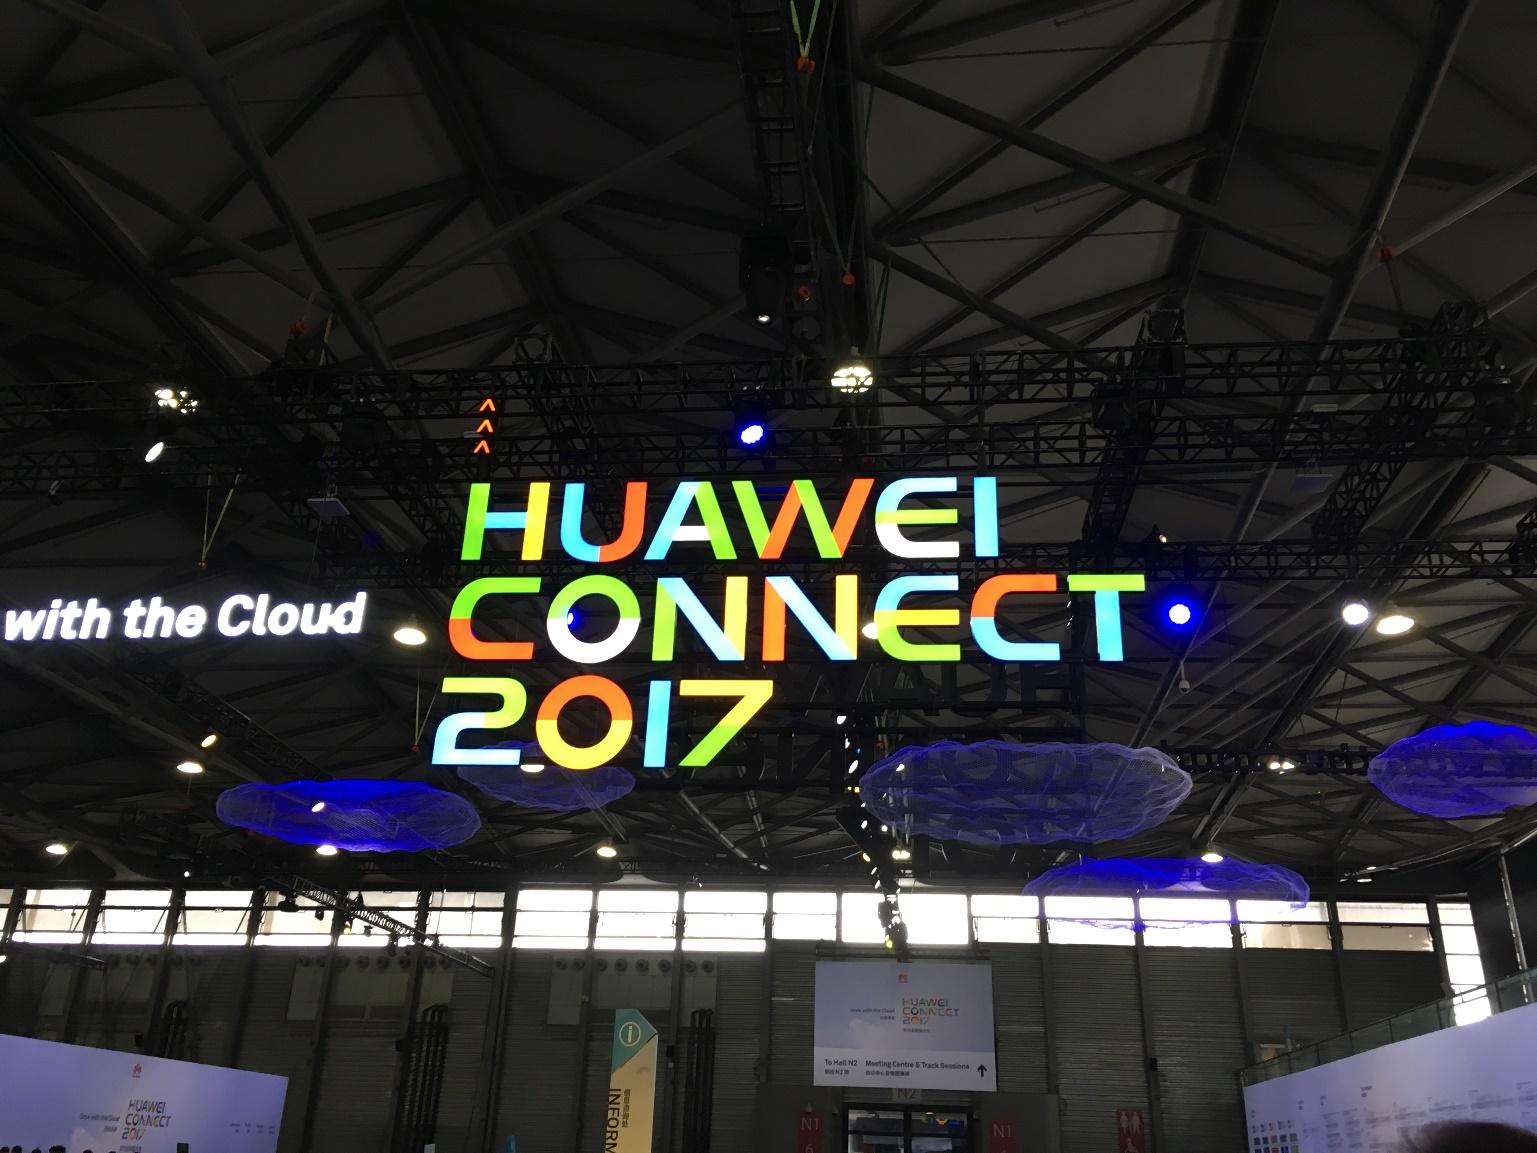 Китай — цифровая держава. Впечатления от Huawei Connect 2017